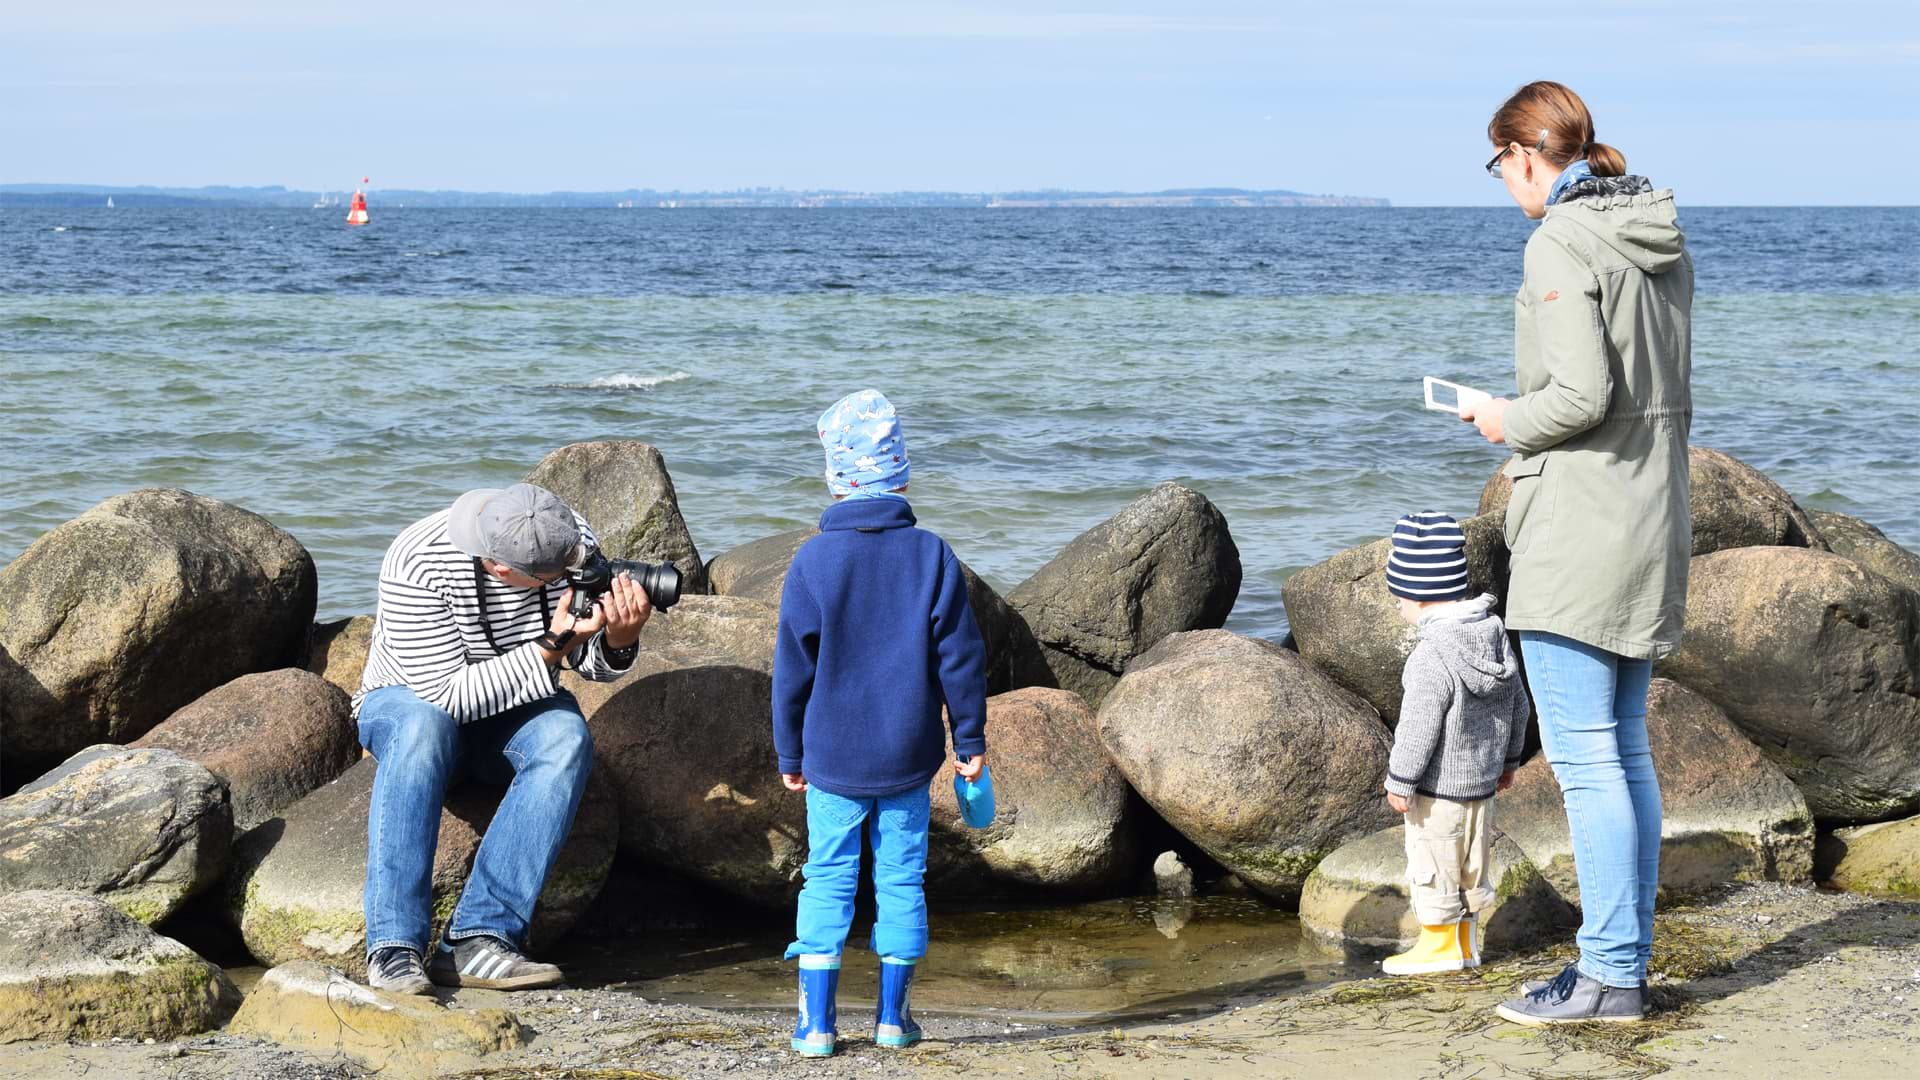 Christian fotografiert die Familie an der Ostsee